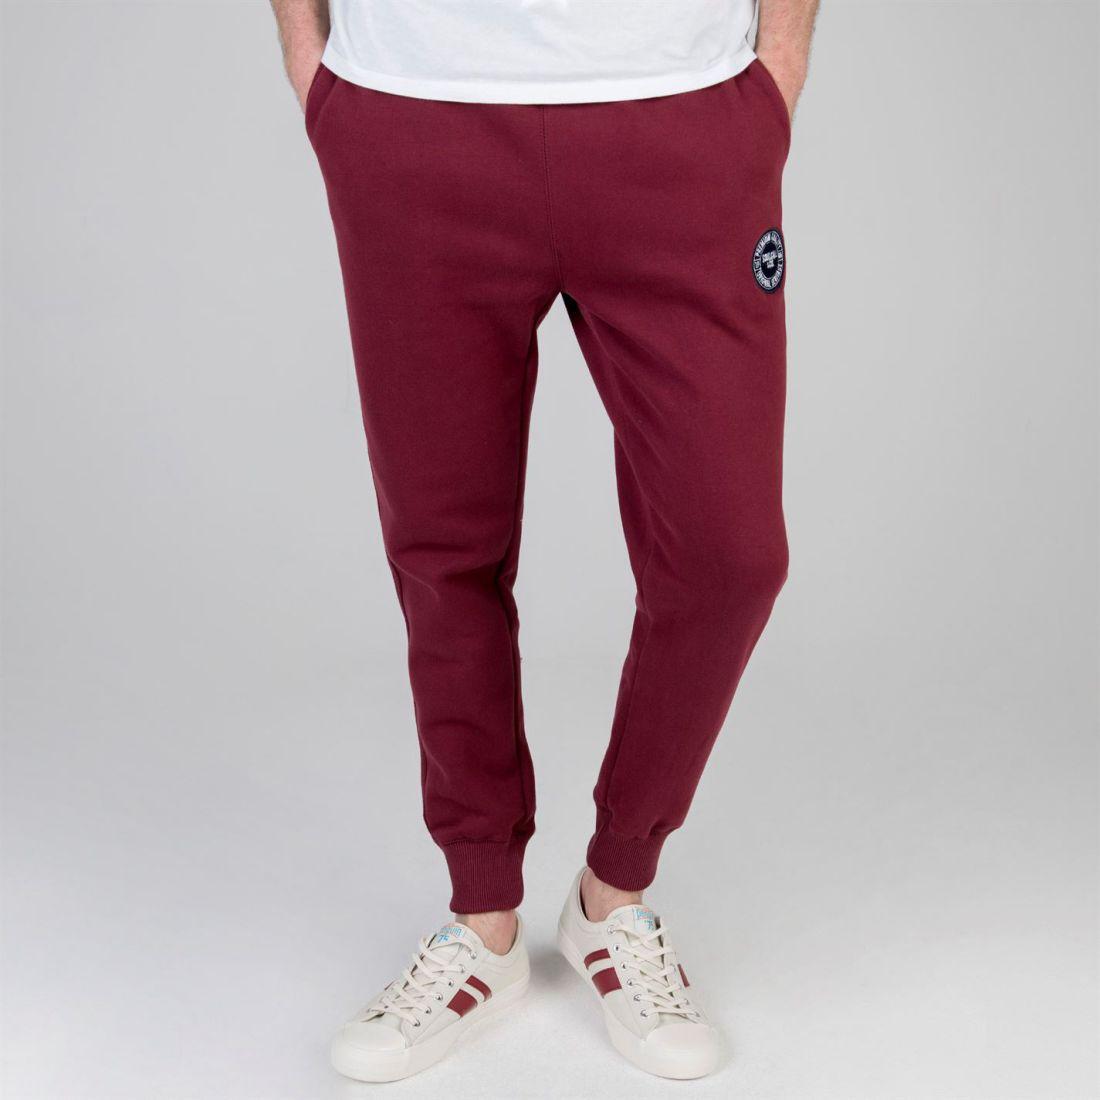 dbac7df1d05d SoulCal Signature Fleece Sweatpants Mens Gents Jogging Bottoms Trousers  Pants. SoulCal Signature Fleece Joggers Mens